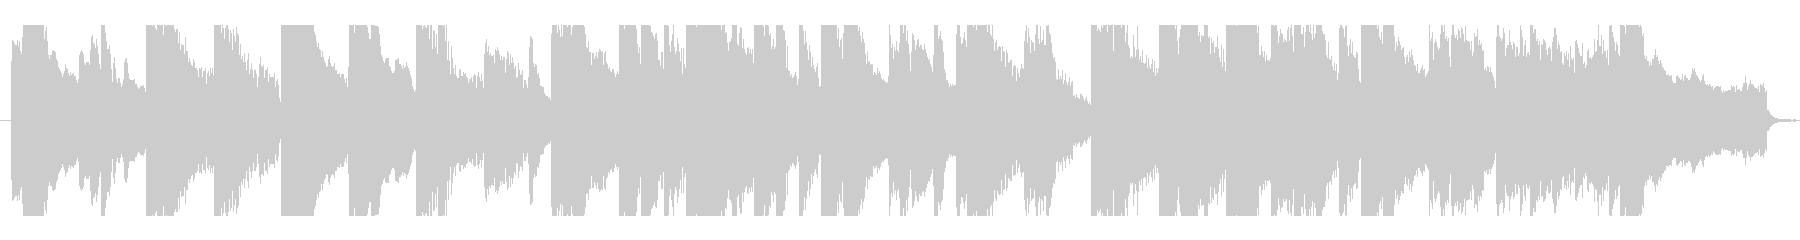 Emotional Pianoの未再生の波形